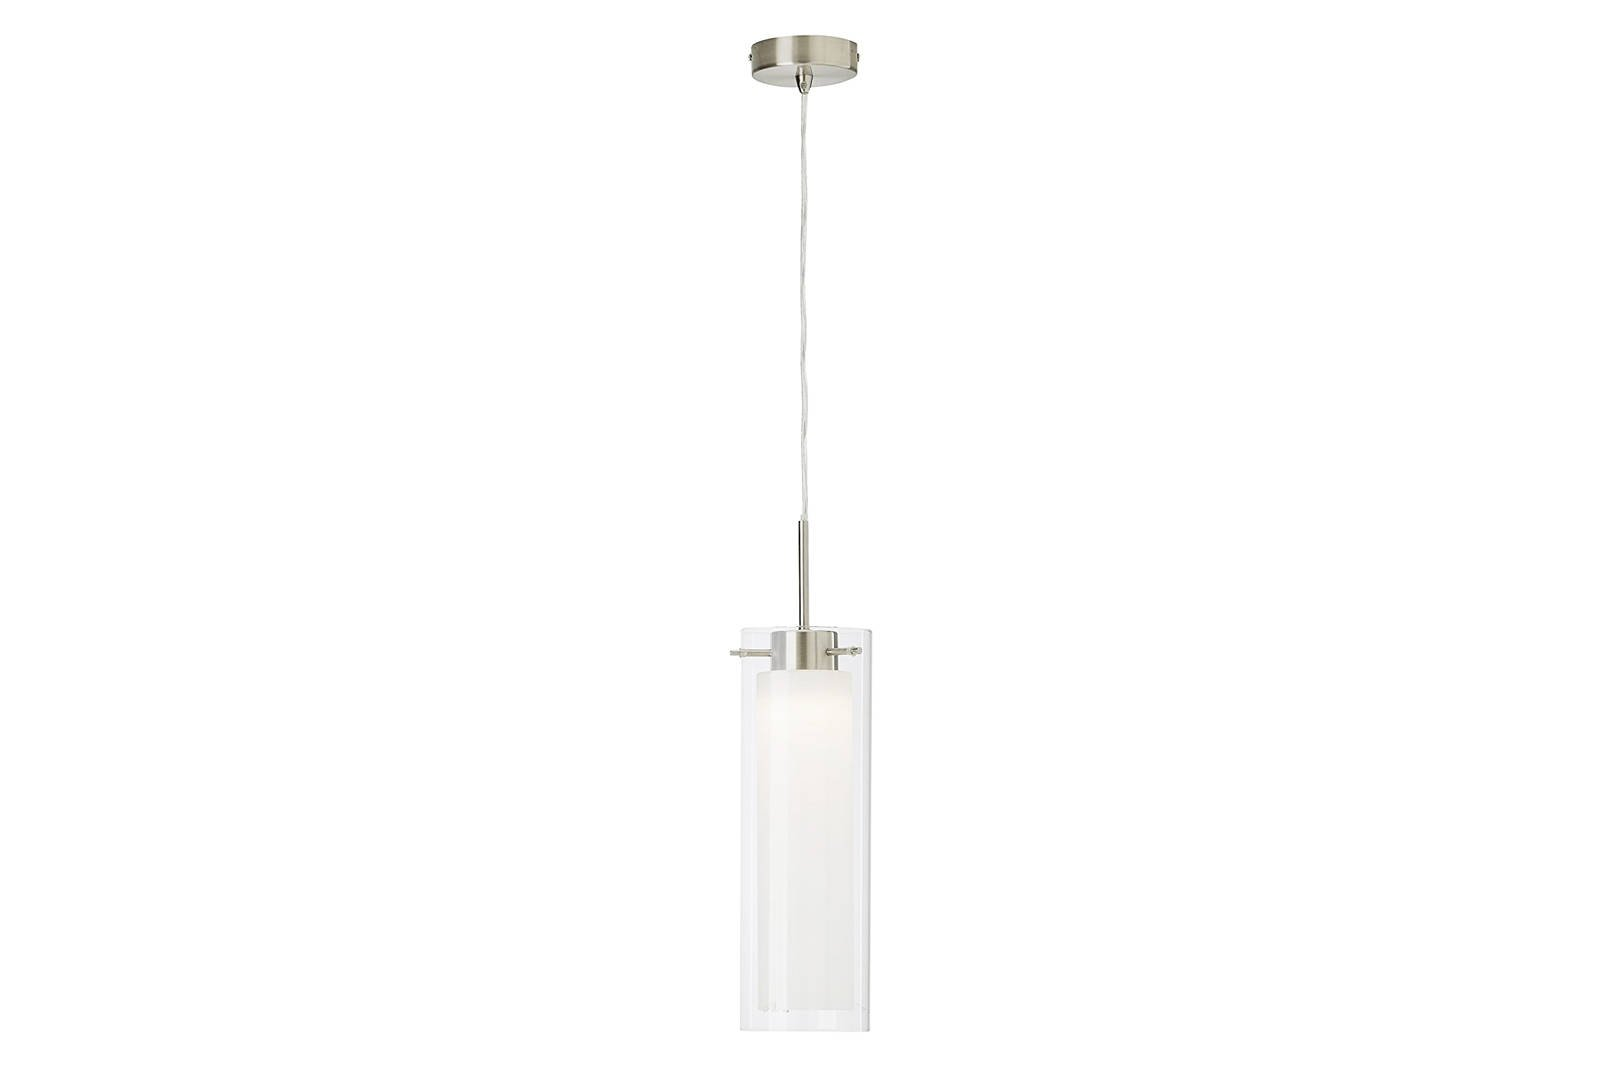 Briloner Double Pendant Light 4258-012 5W LED